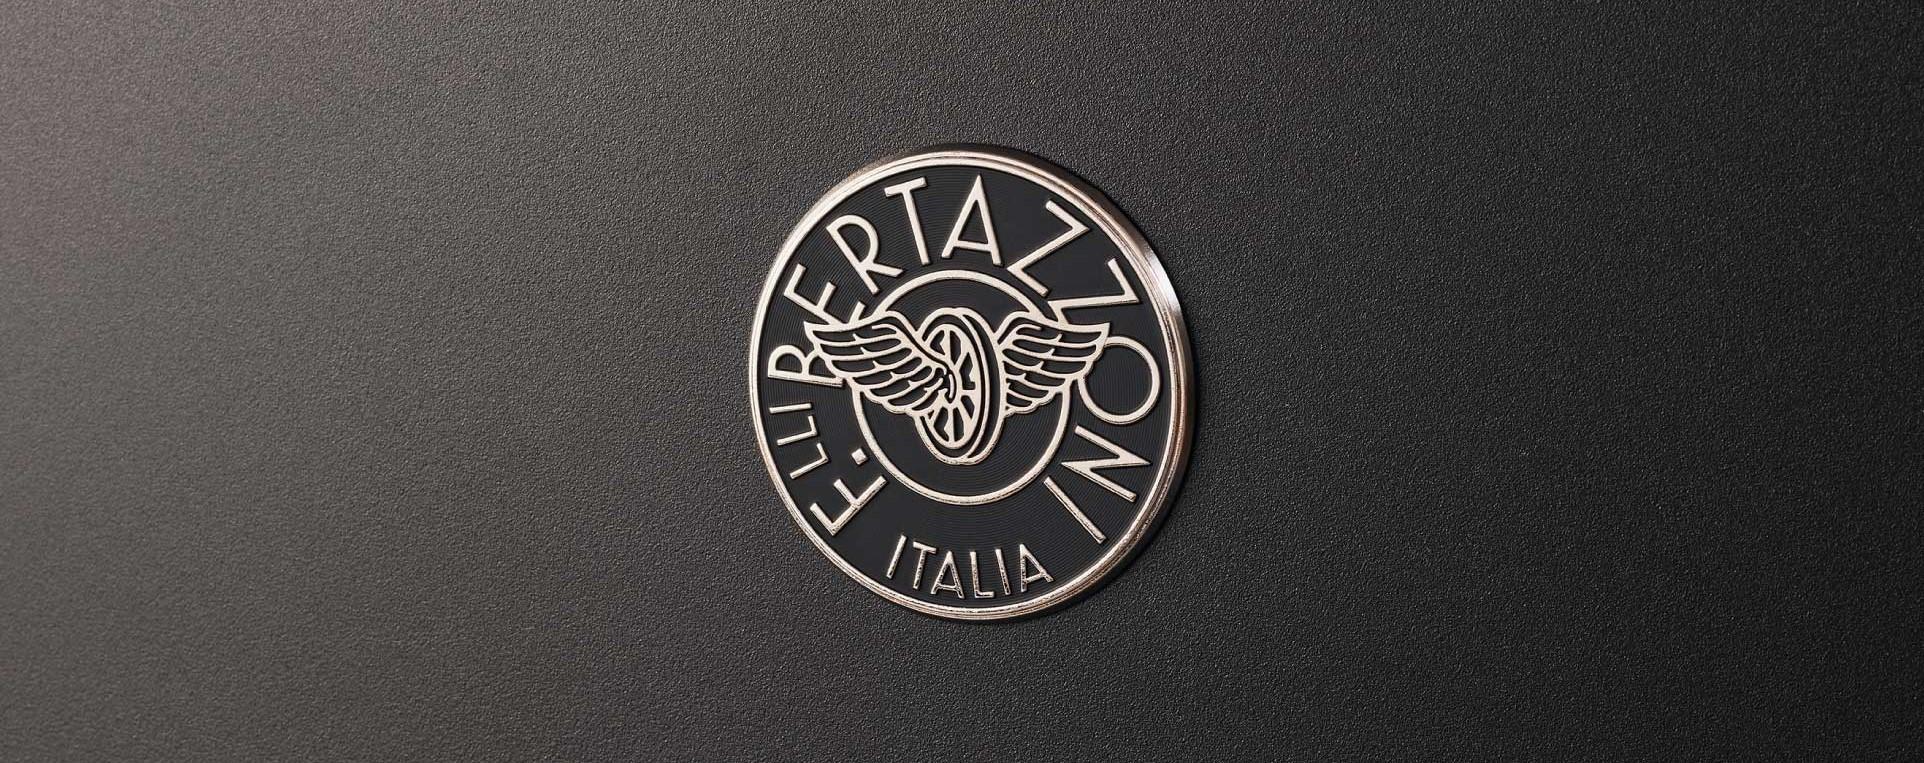 Bertazzoni branding for brand page